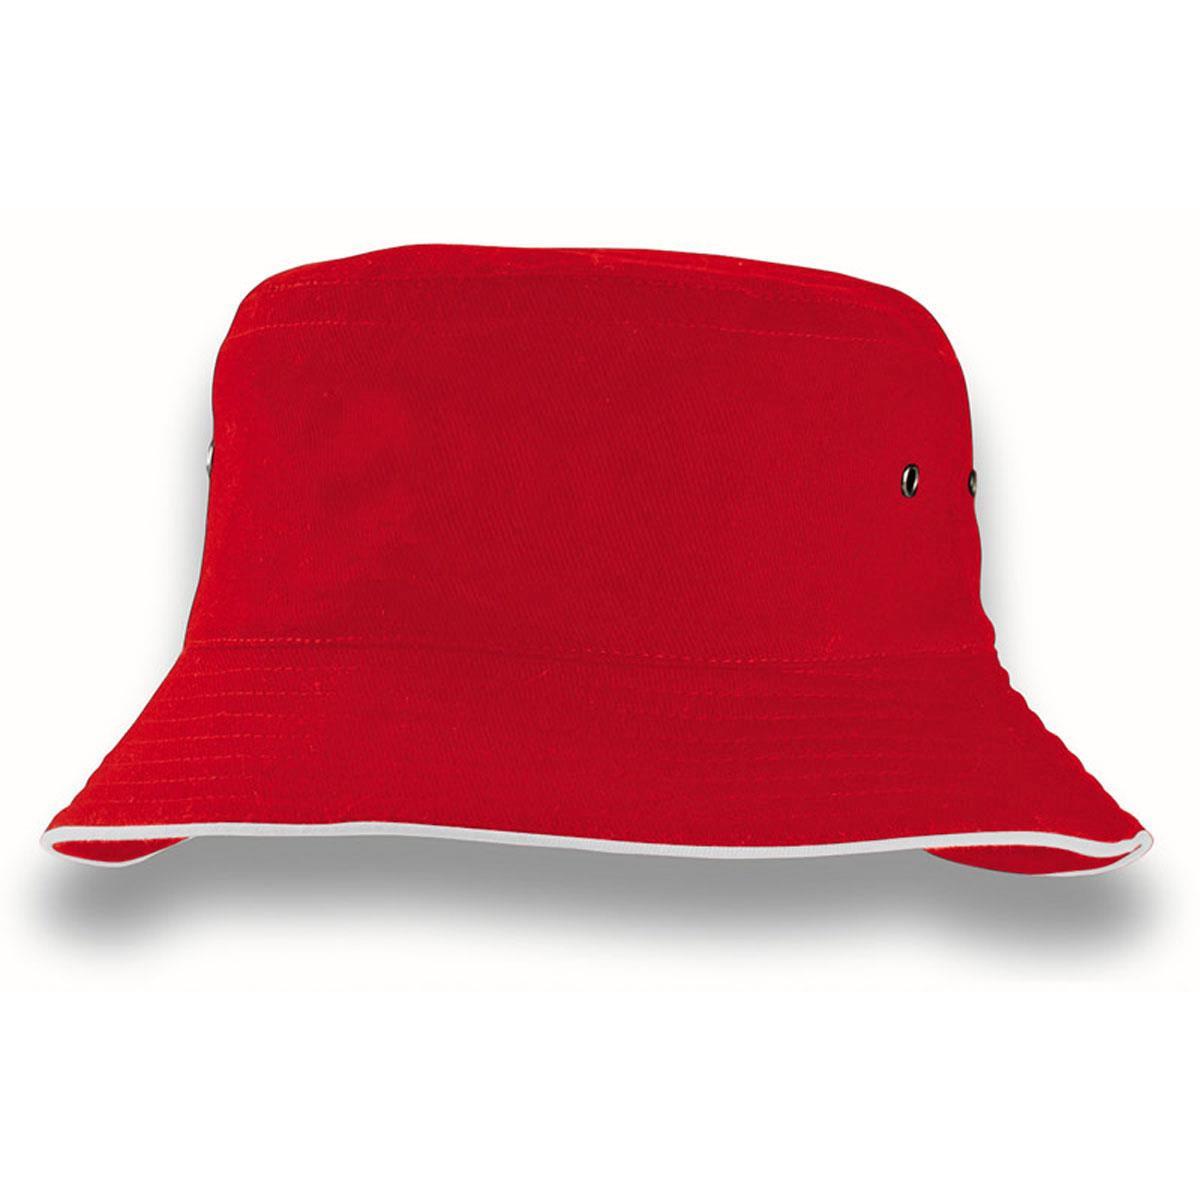 New - Black & Red Godfather Style Bucket Hat (BK17) | eBay  |Red Bucket Hat